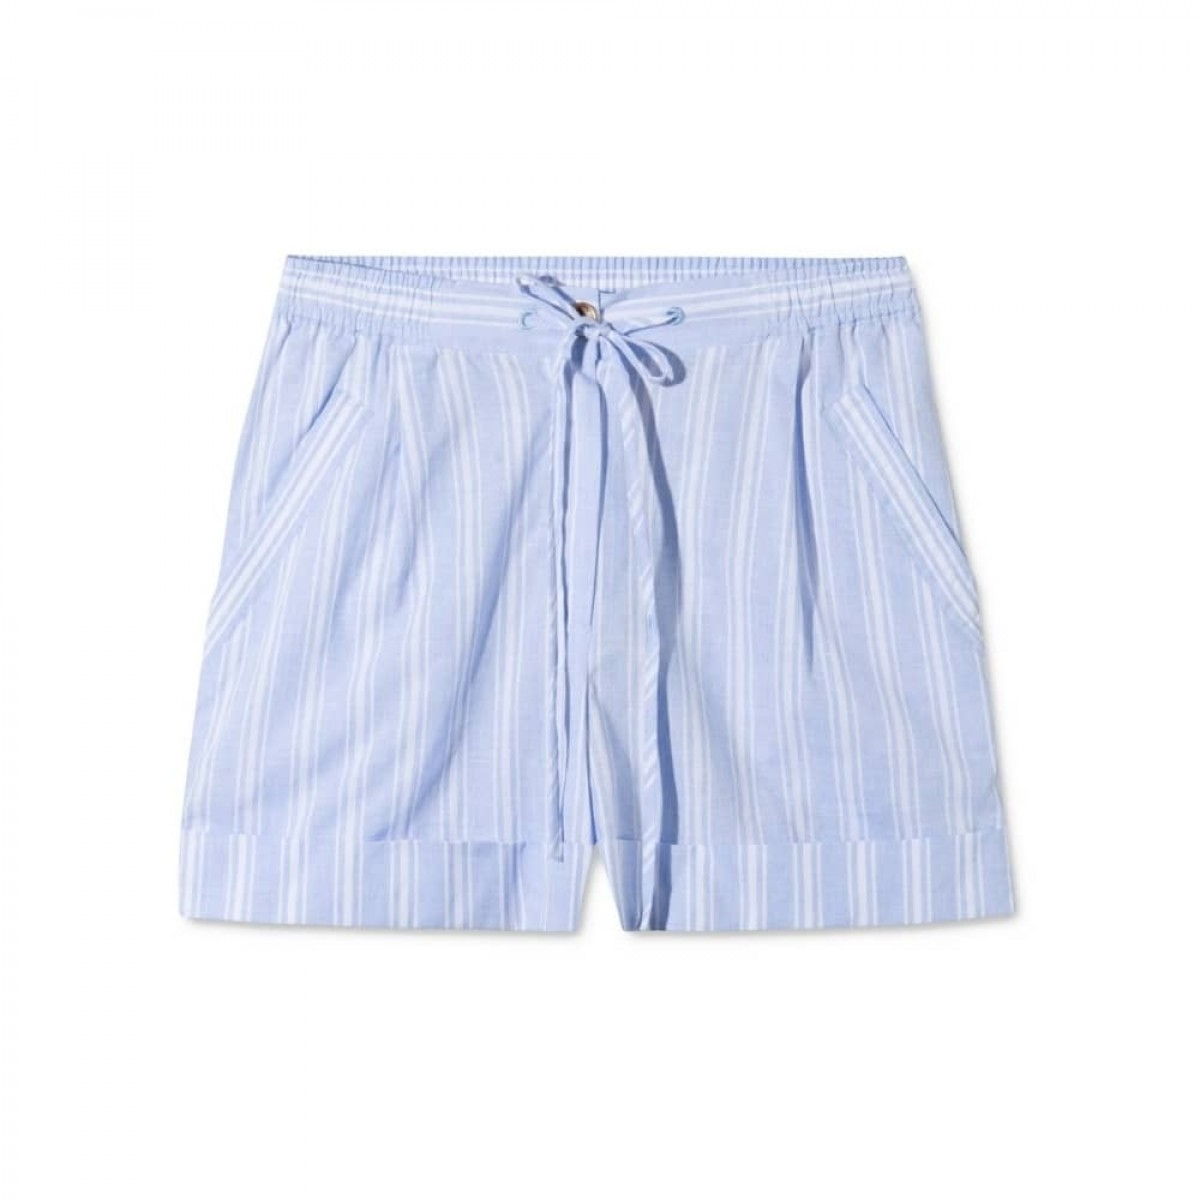 peony shorts - blue/white stripe